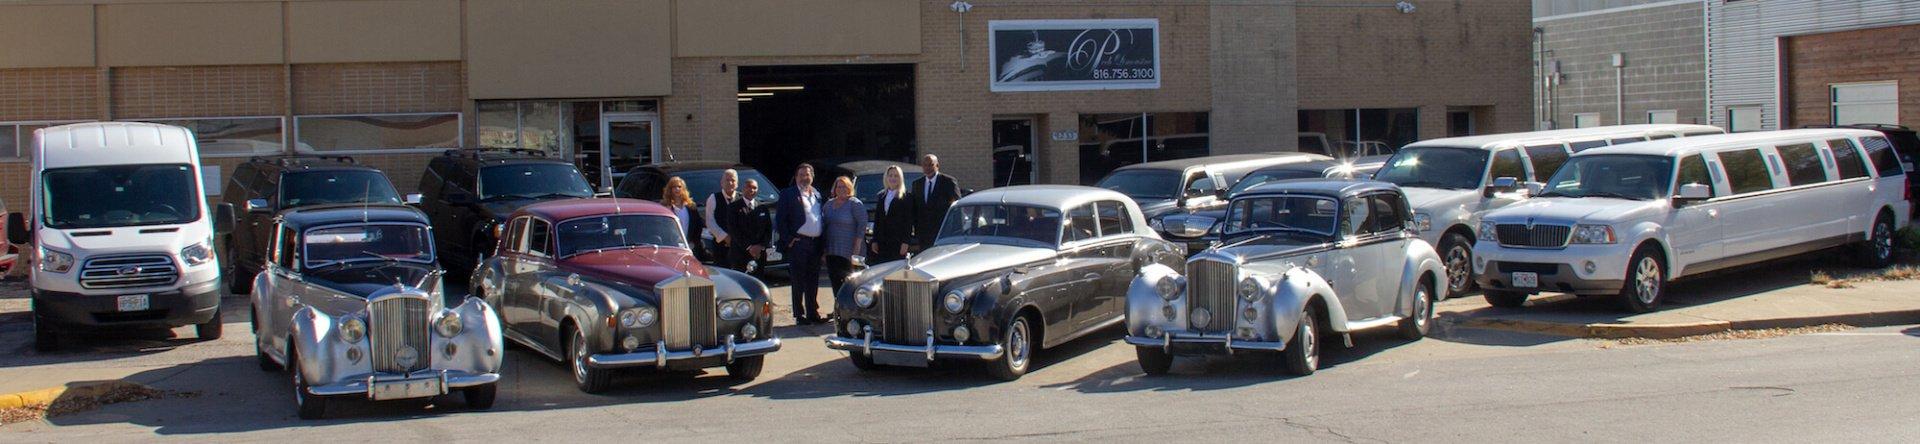 limousine pech fleet kc limo service line company